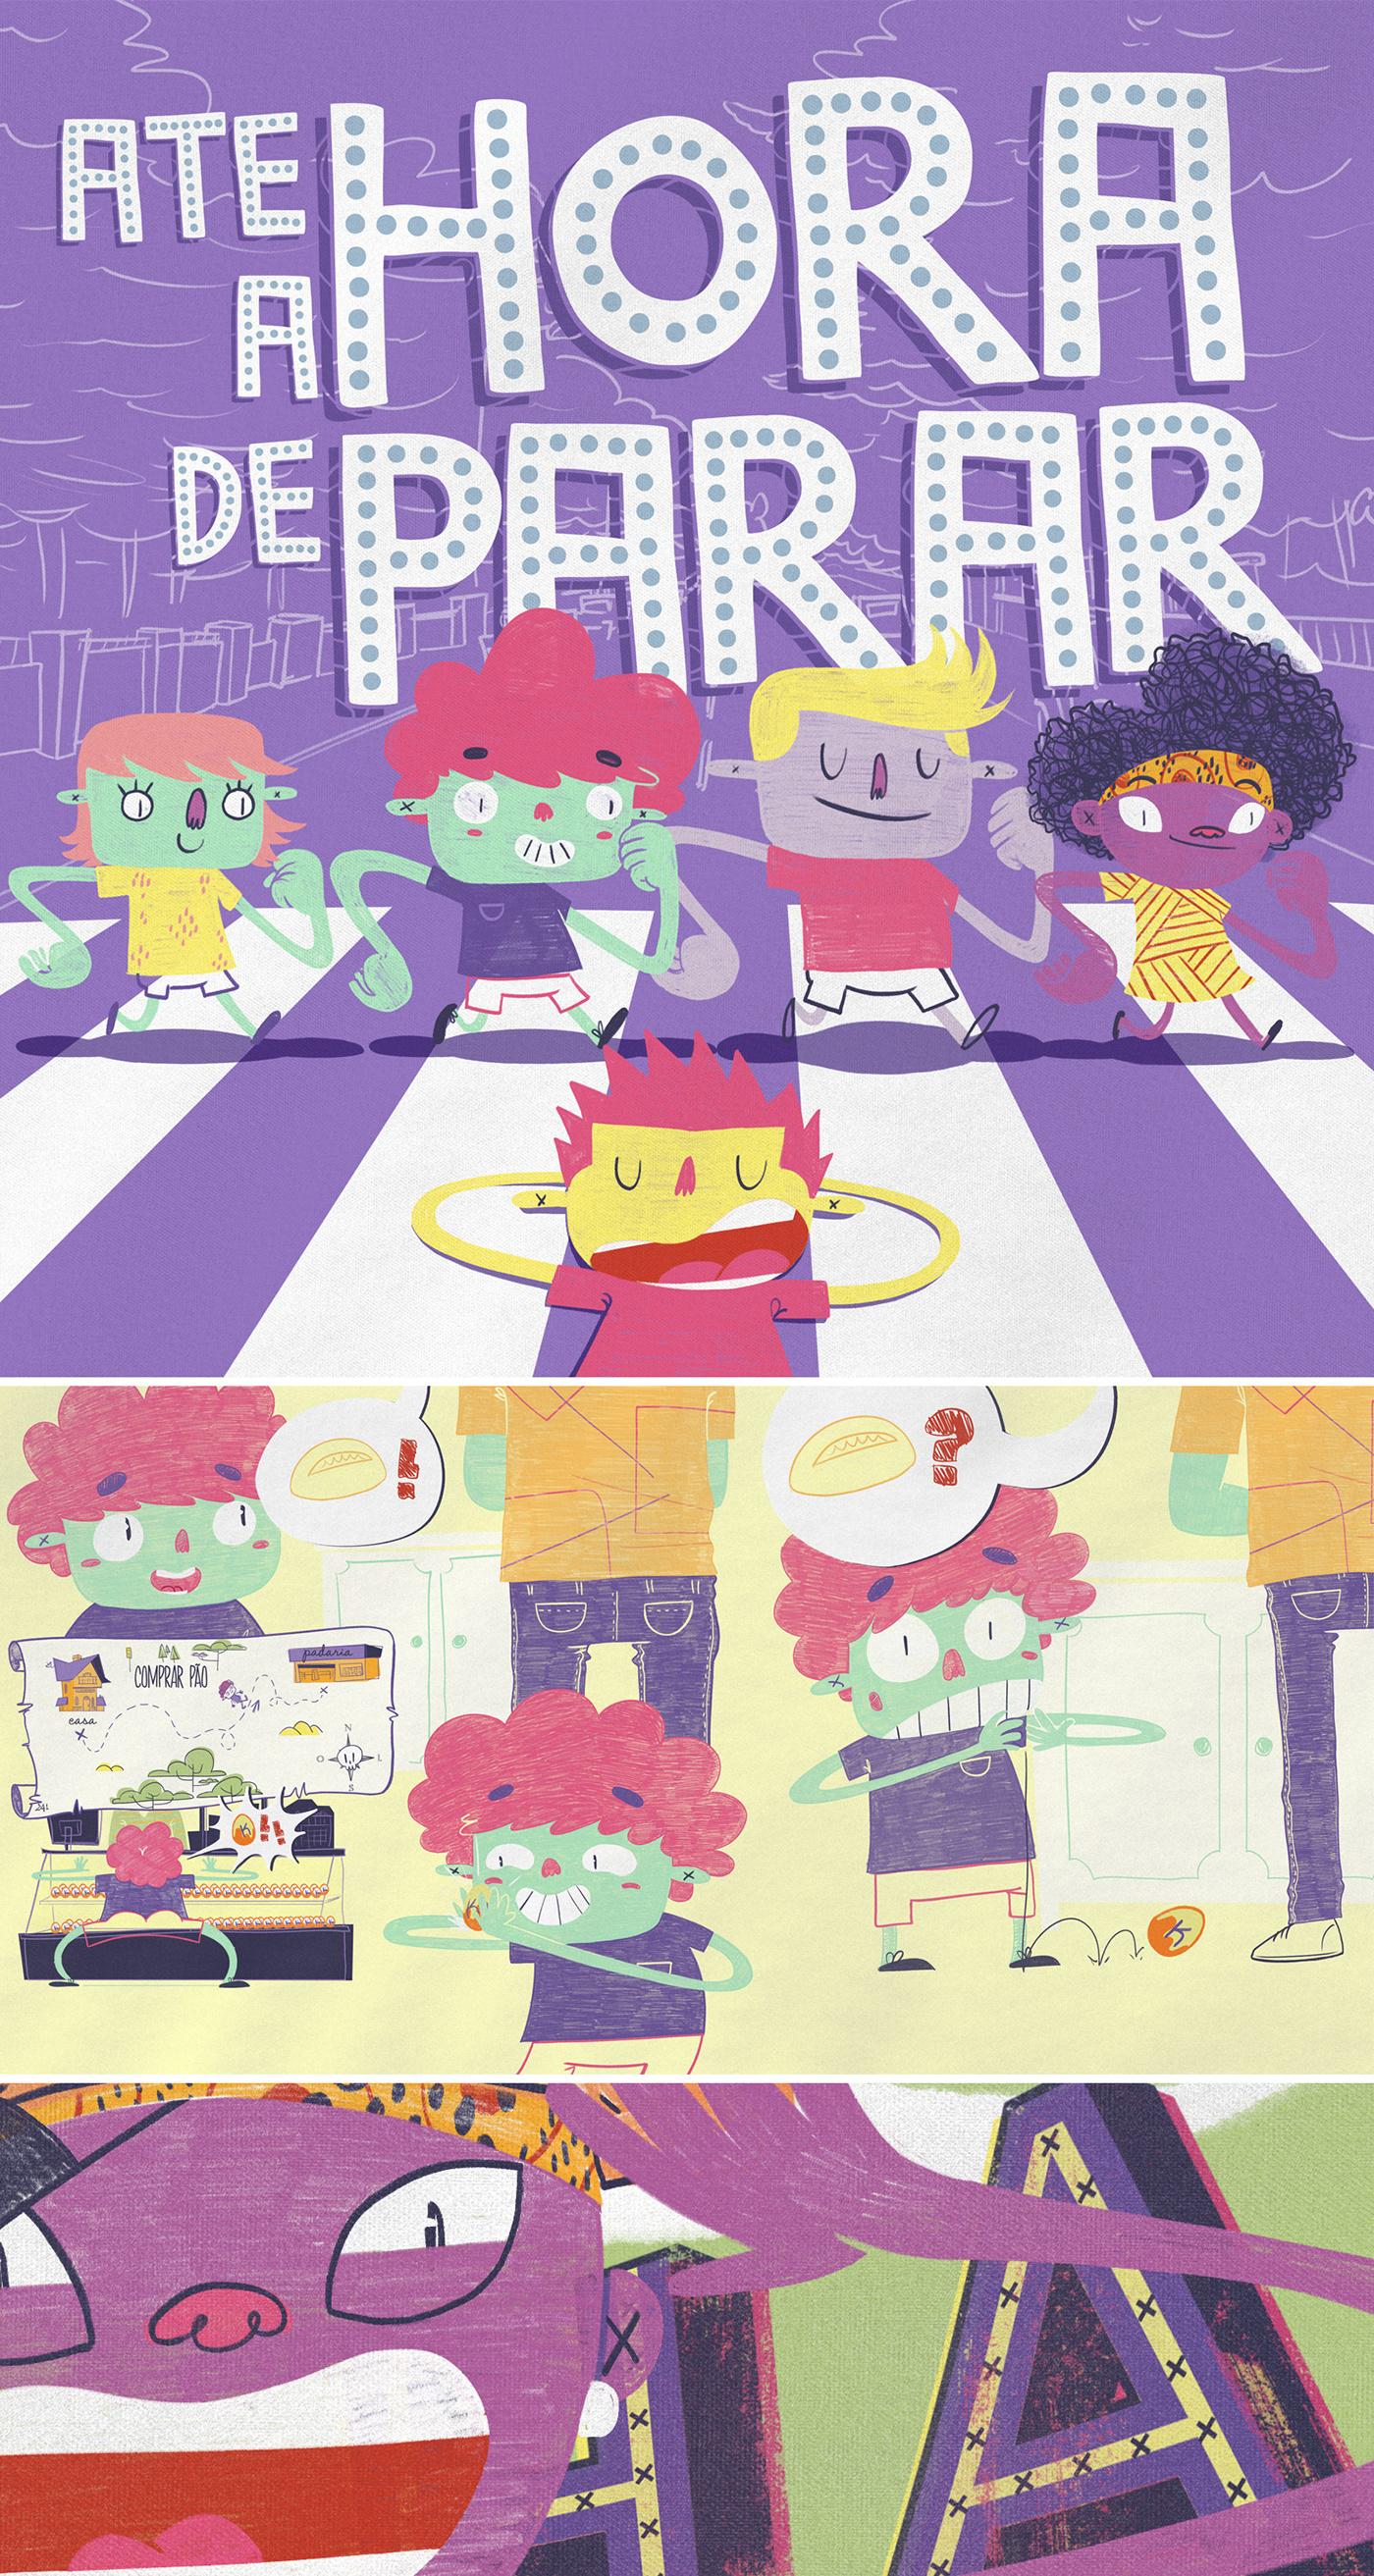 book music Child book Livro infantil colored pencil octane PANTONE 18-3838 Ultra violet